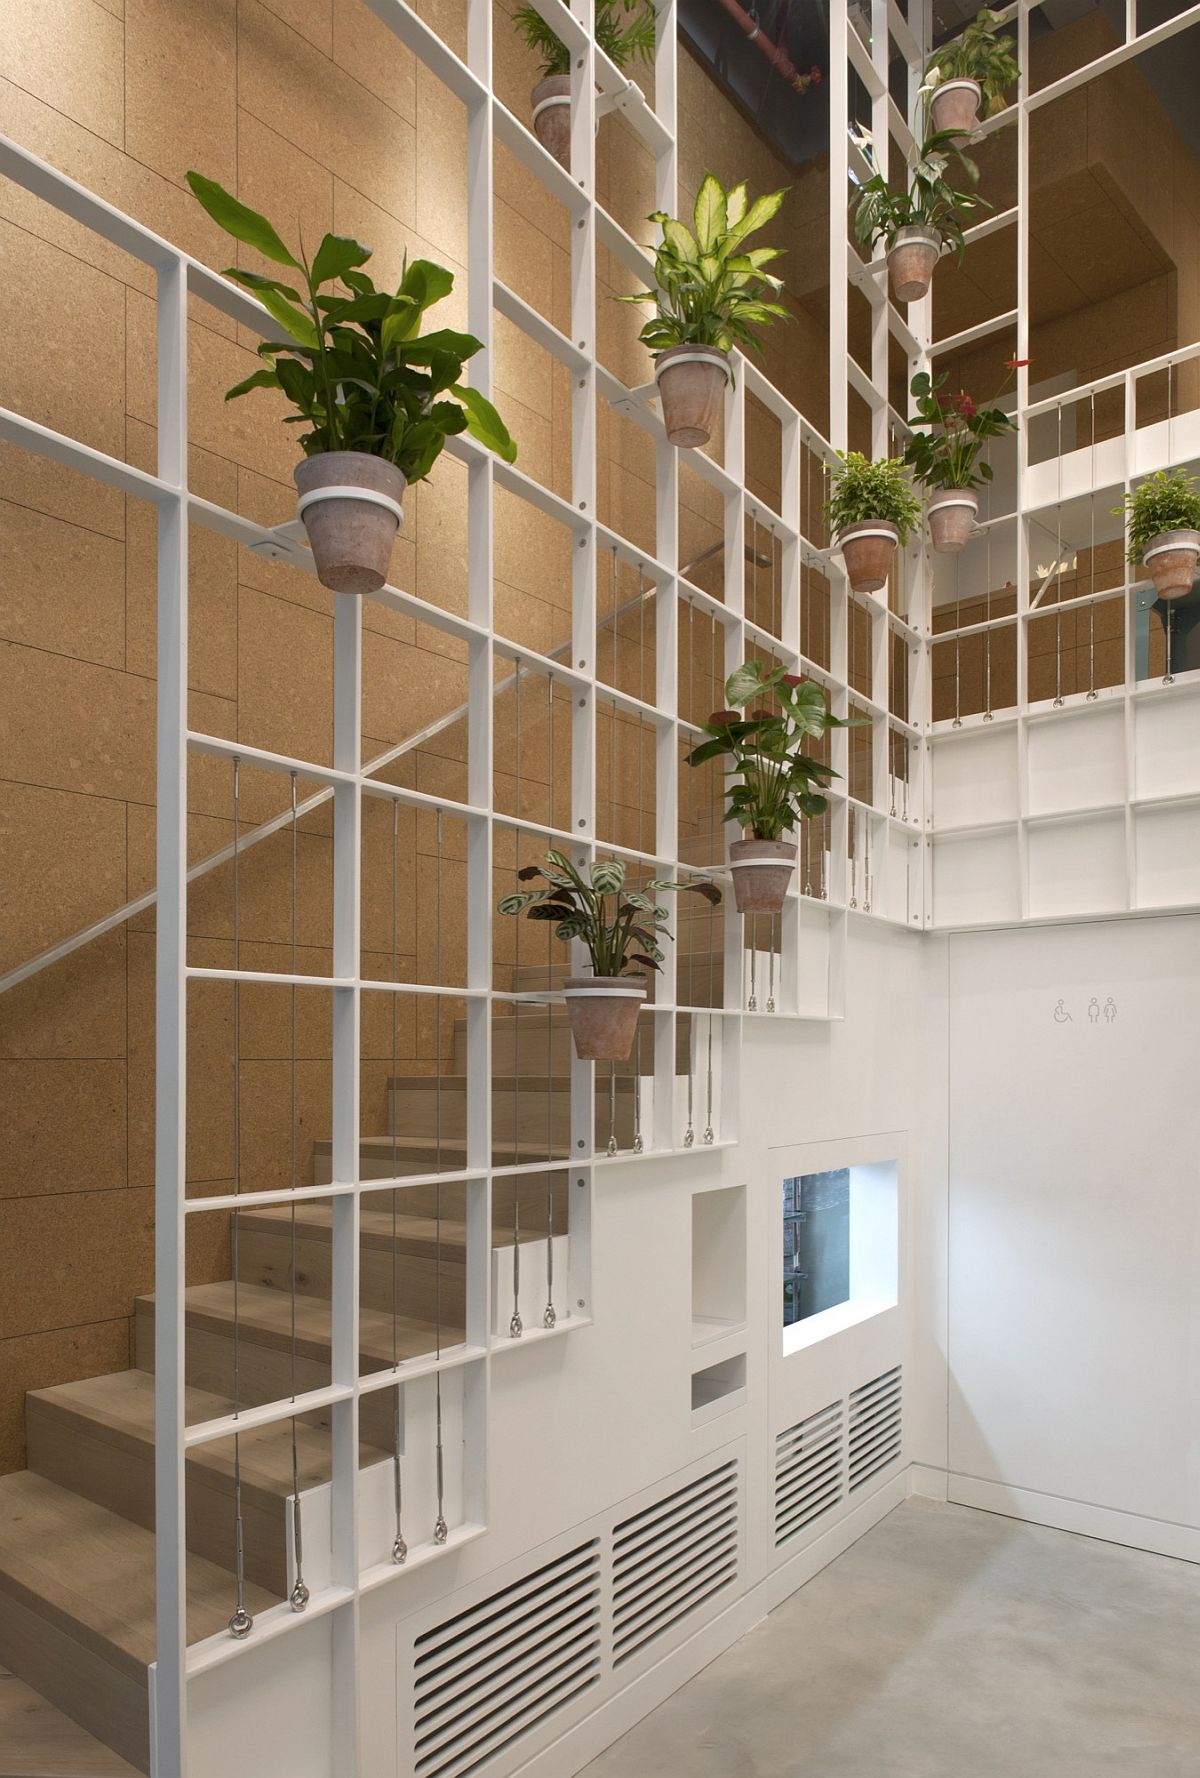 Custom-metallic-grid-gives-the-interior-ist-unique-look